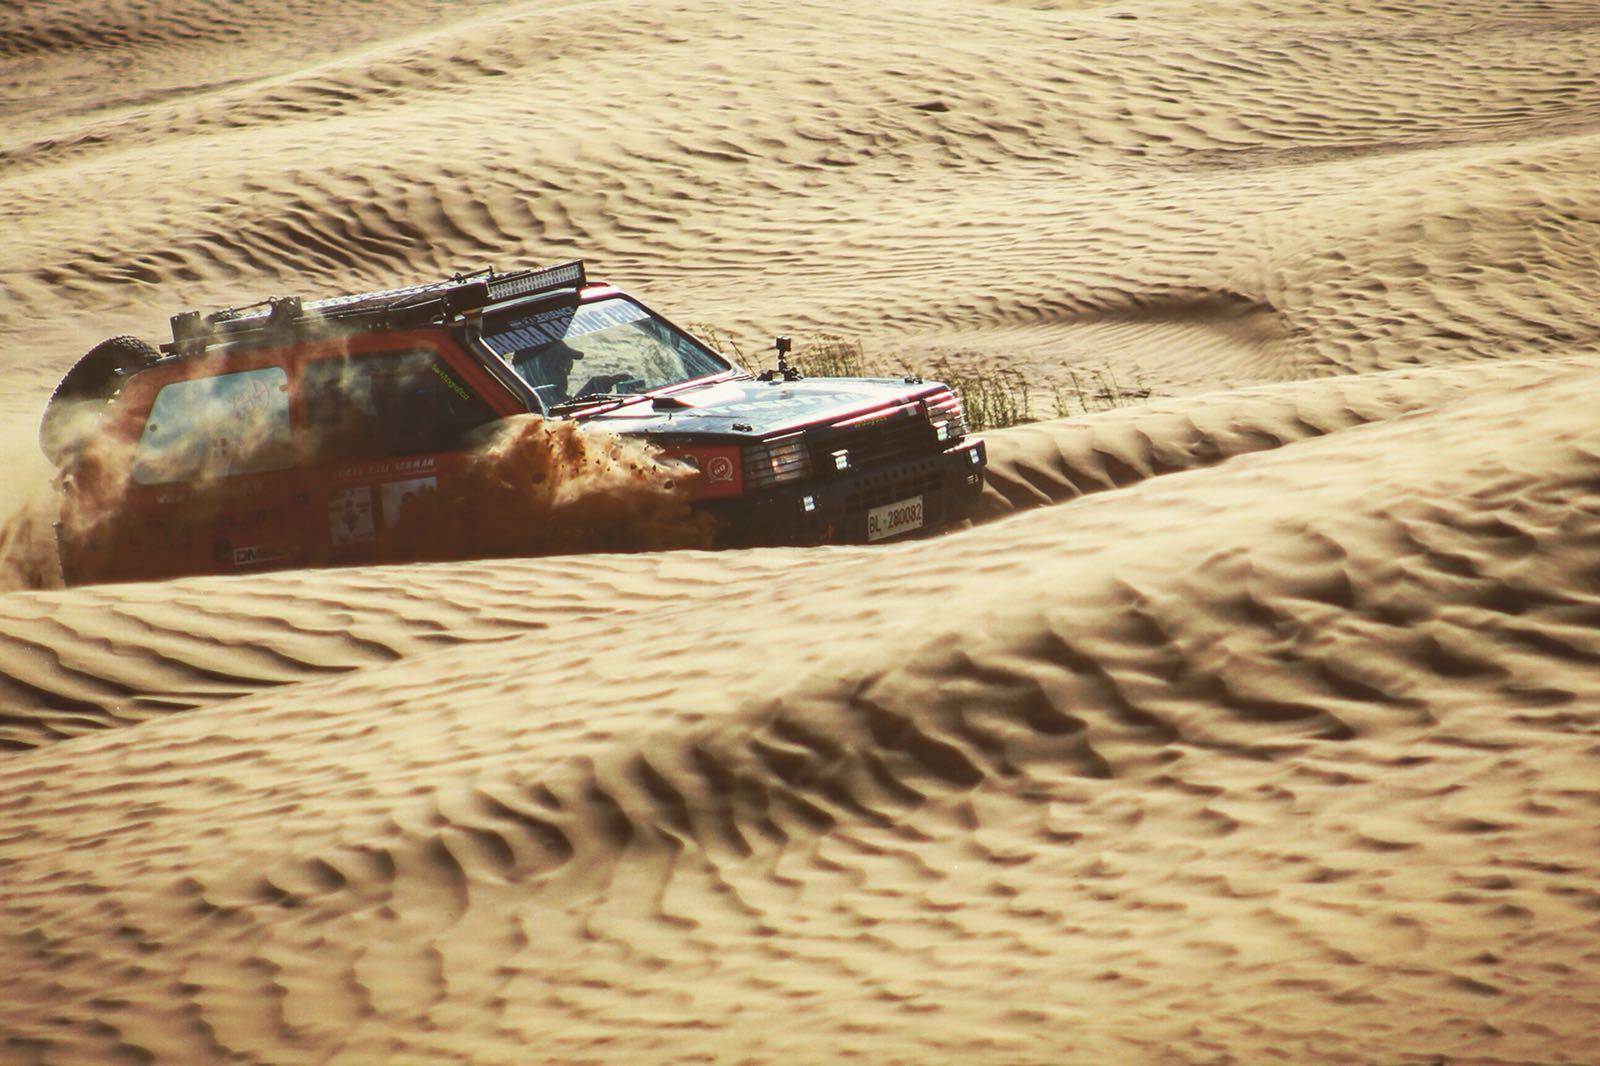 Aci Sport Calendario.Sahara Racing Cup Aci Sport Apre Le Porte Alla Gara Con Le